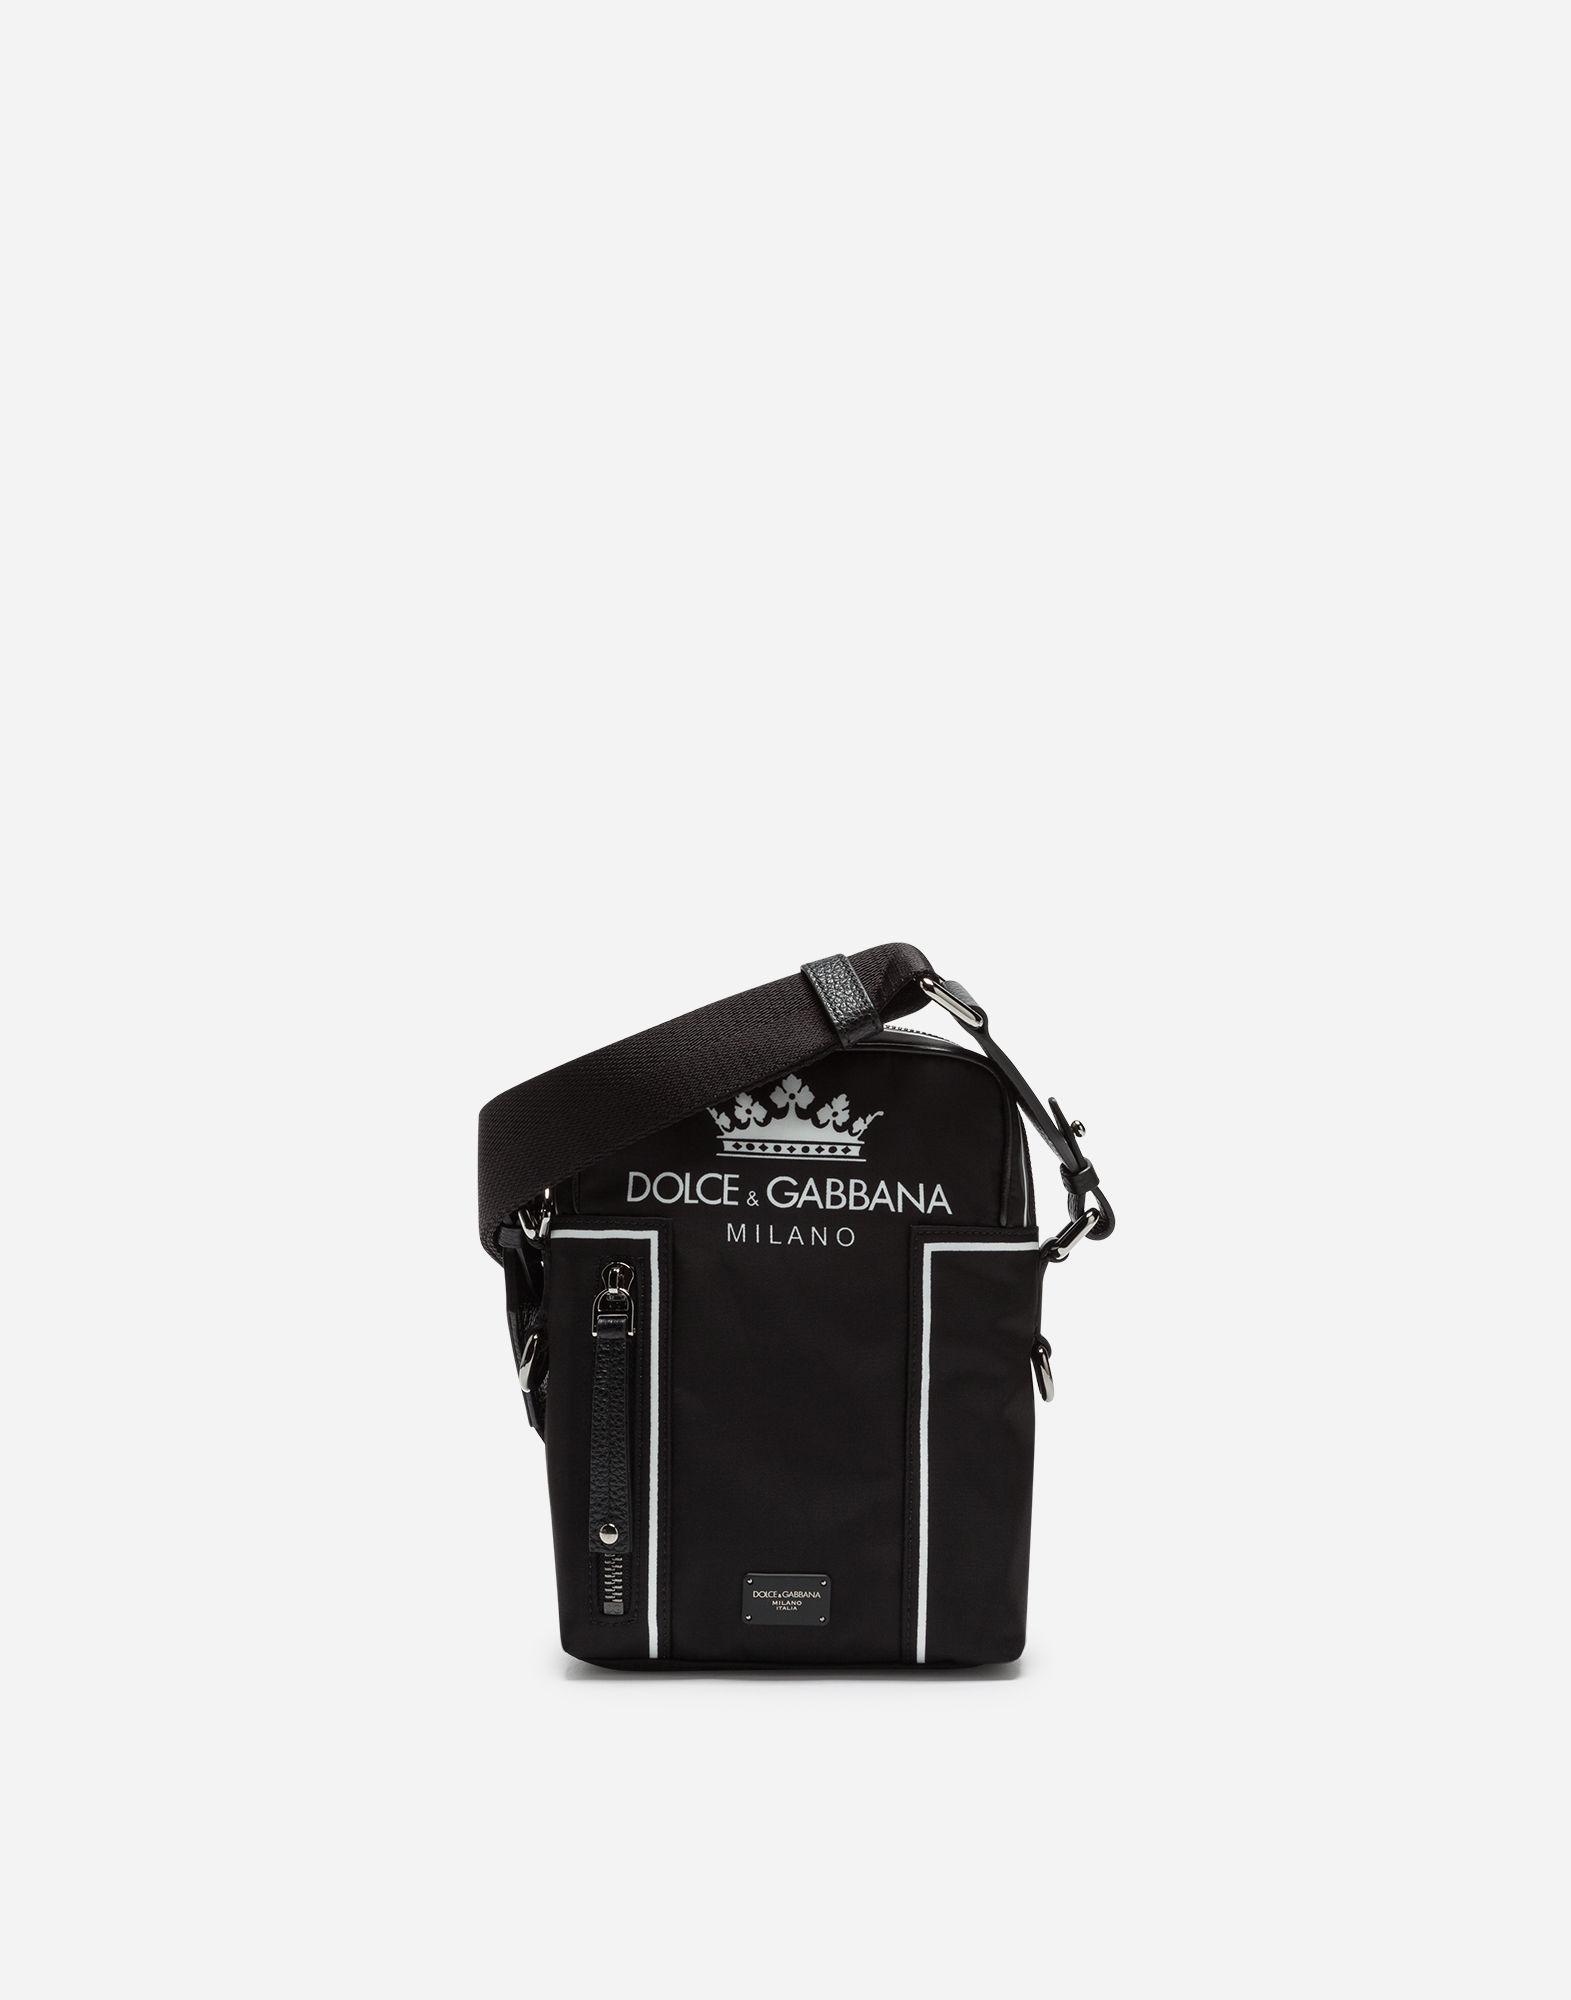 5a21e7dc9 Dolce   Gabbana Vulcano Shoulder Bag In Printed Nylon In Black ...